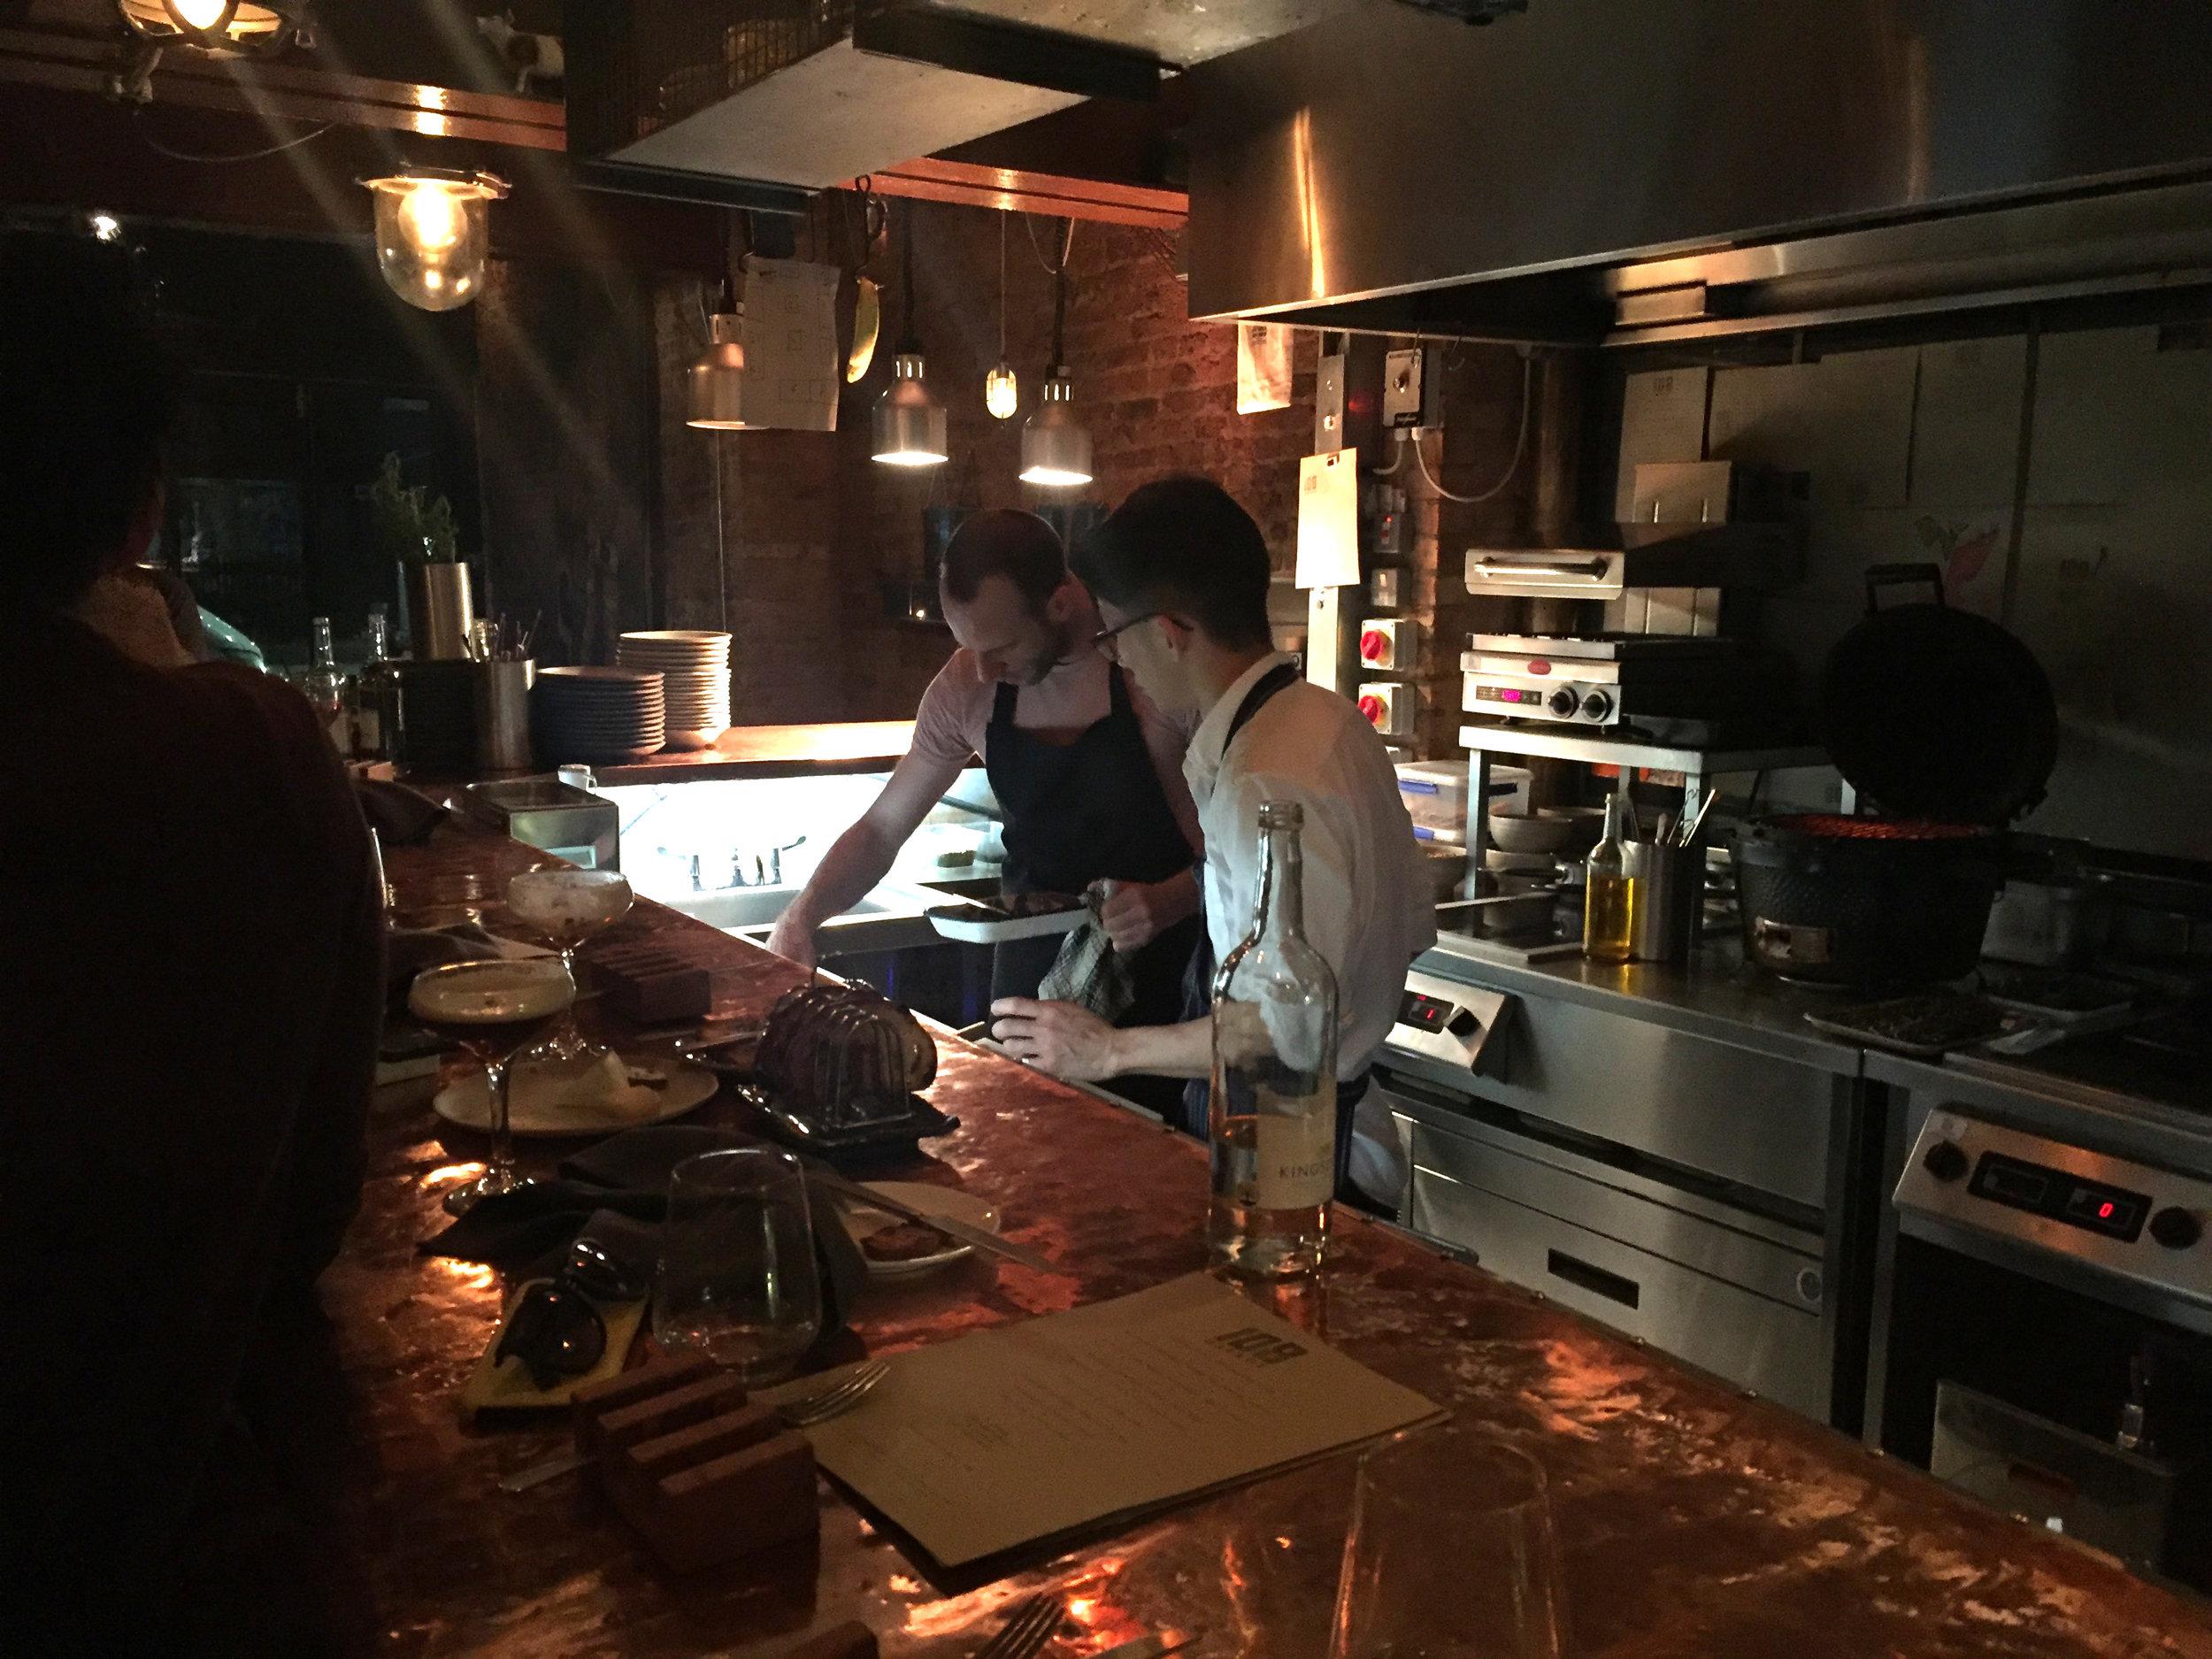 Executive Chef:Chris Denney - Cuisine: Modern European/AsianTwitter: @108GarageInstagram: @108garageAddress: 108 Golborne Rd, London W10 5PSPhone: 020 8969 3769Website: 108garage.com